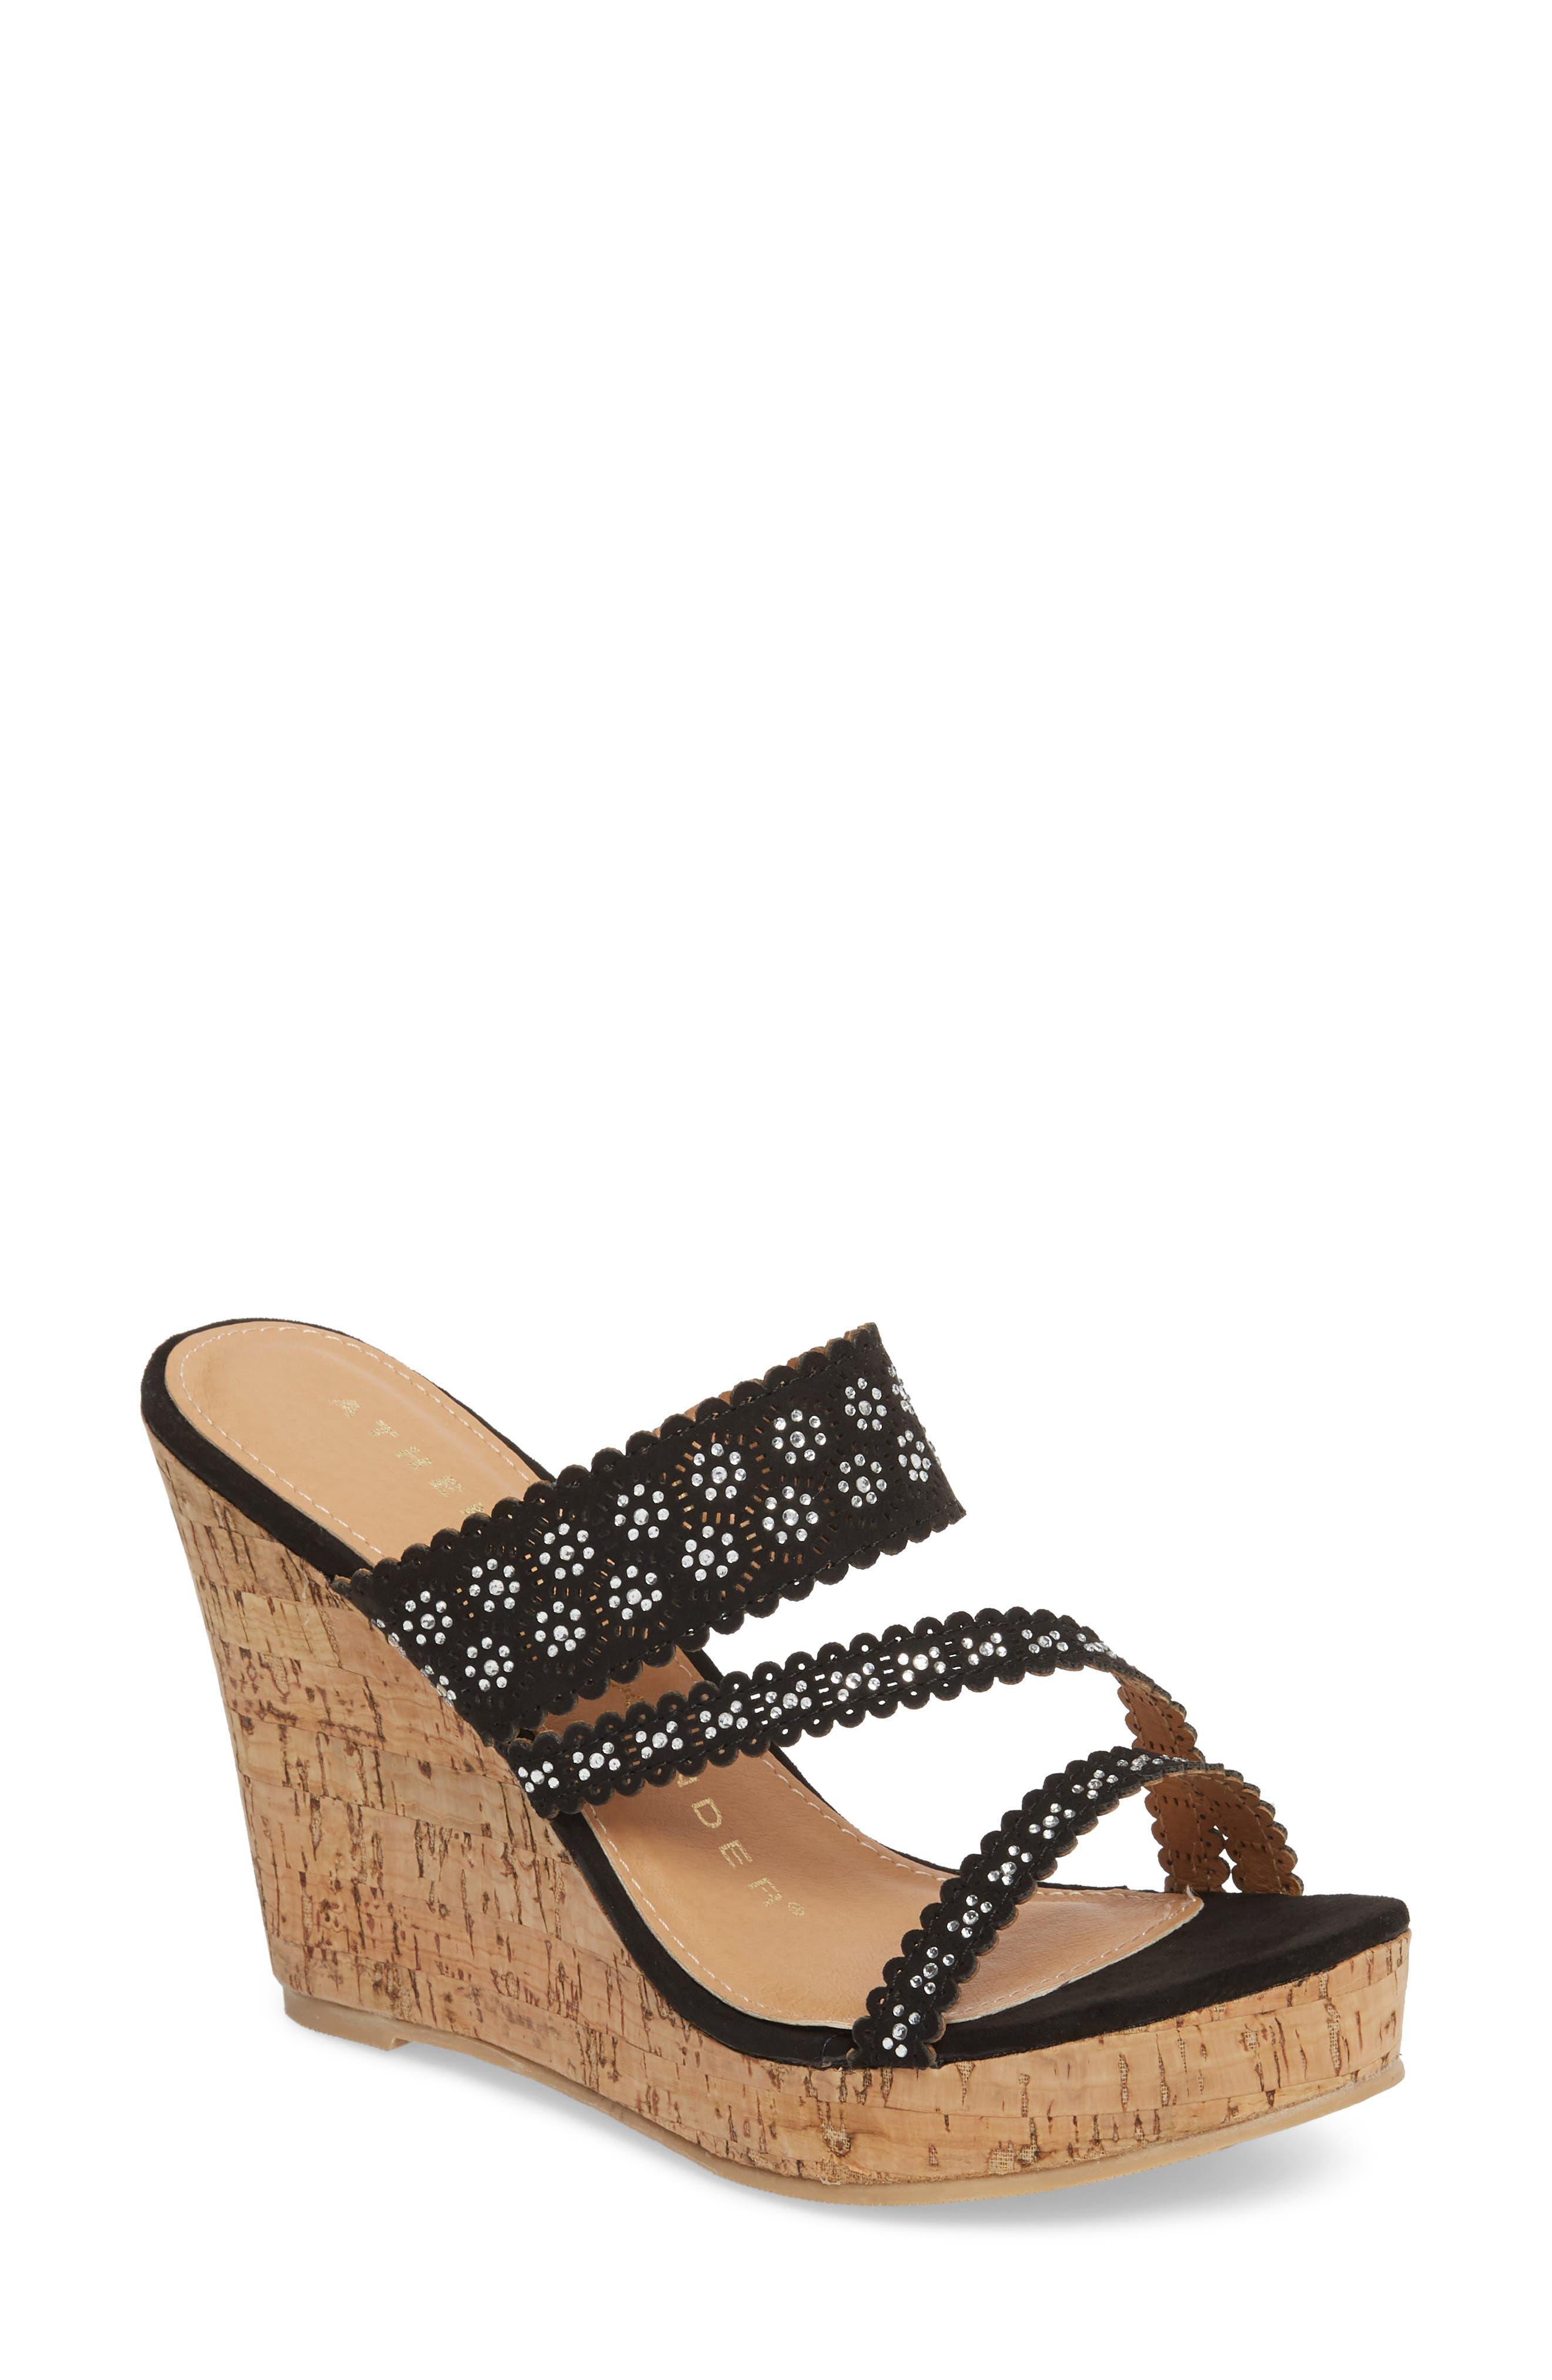 Alternate Image 1 Selected - Athena Alexander Aerin Embellished Wedge Sandal (Women)